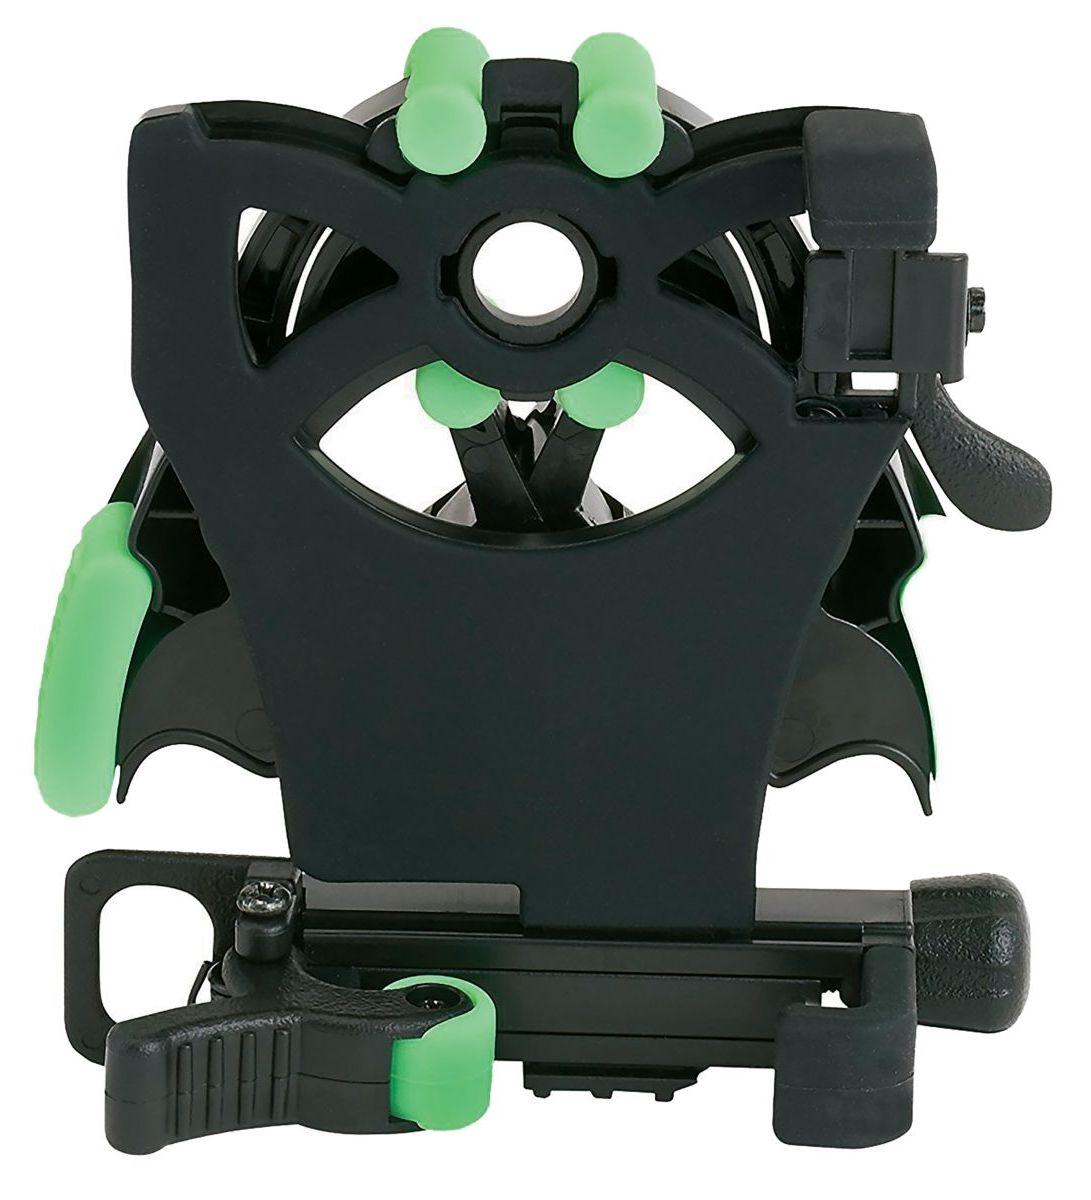 Carson HookUpz™ 2.0 Universal Adapter